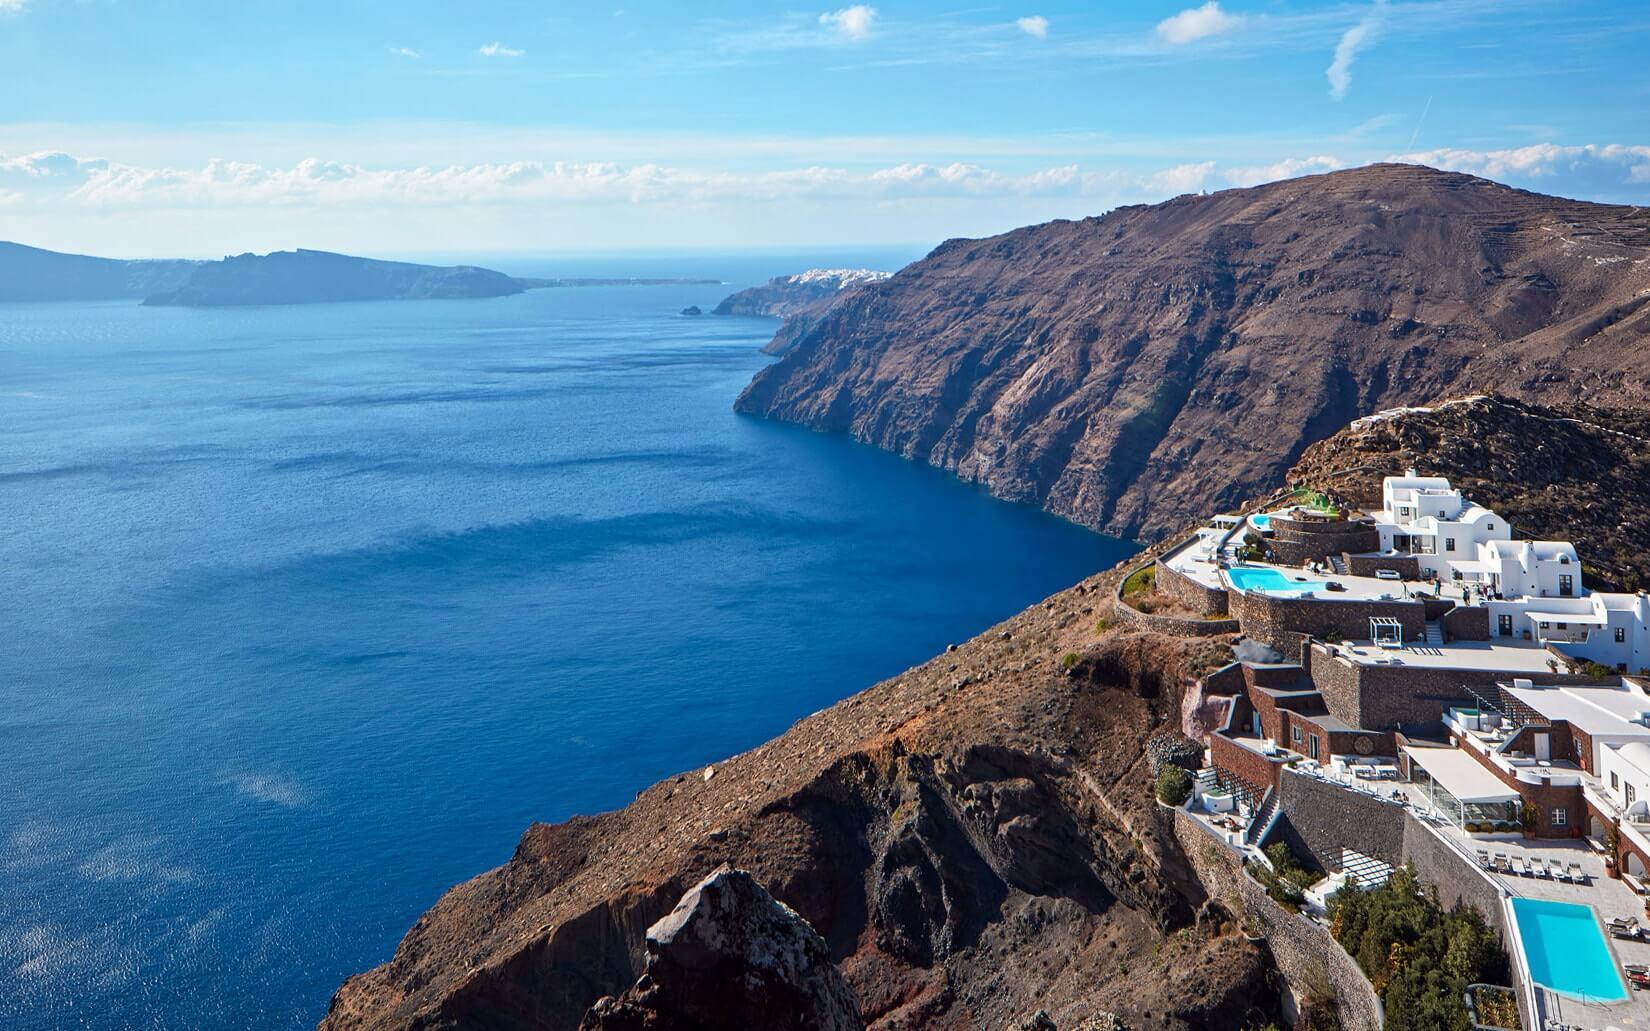 Panoramic view of San Antonio Santorini overlooking the Aegean sea.